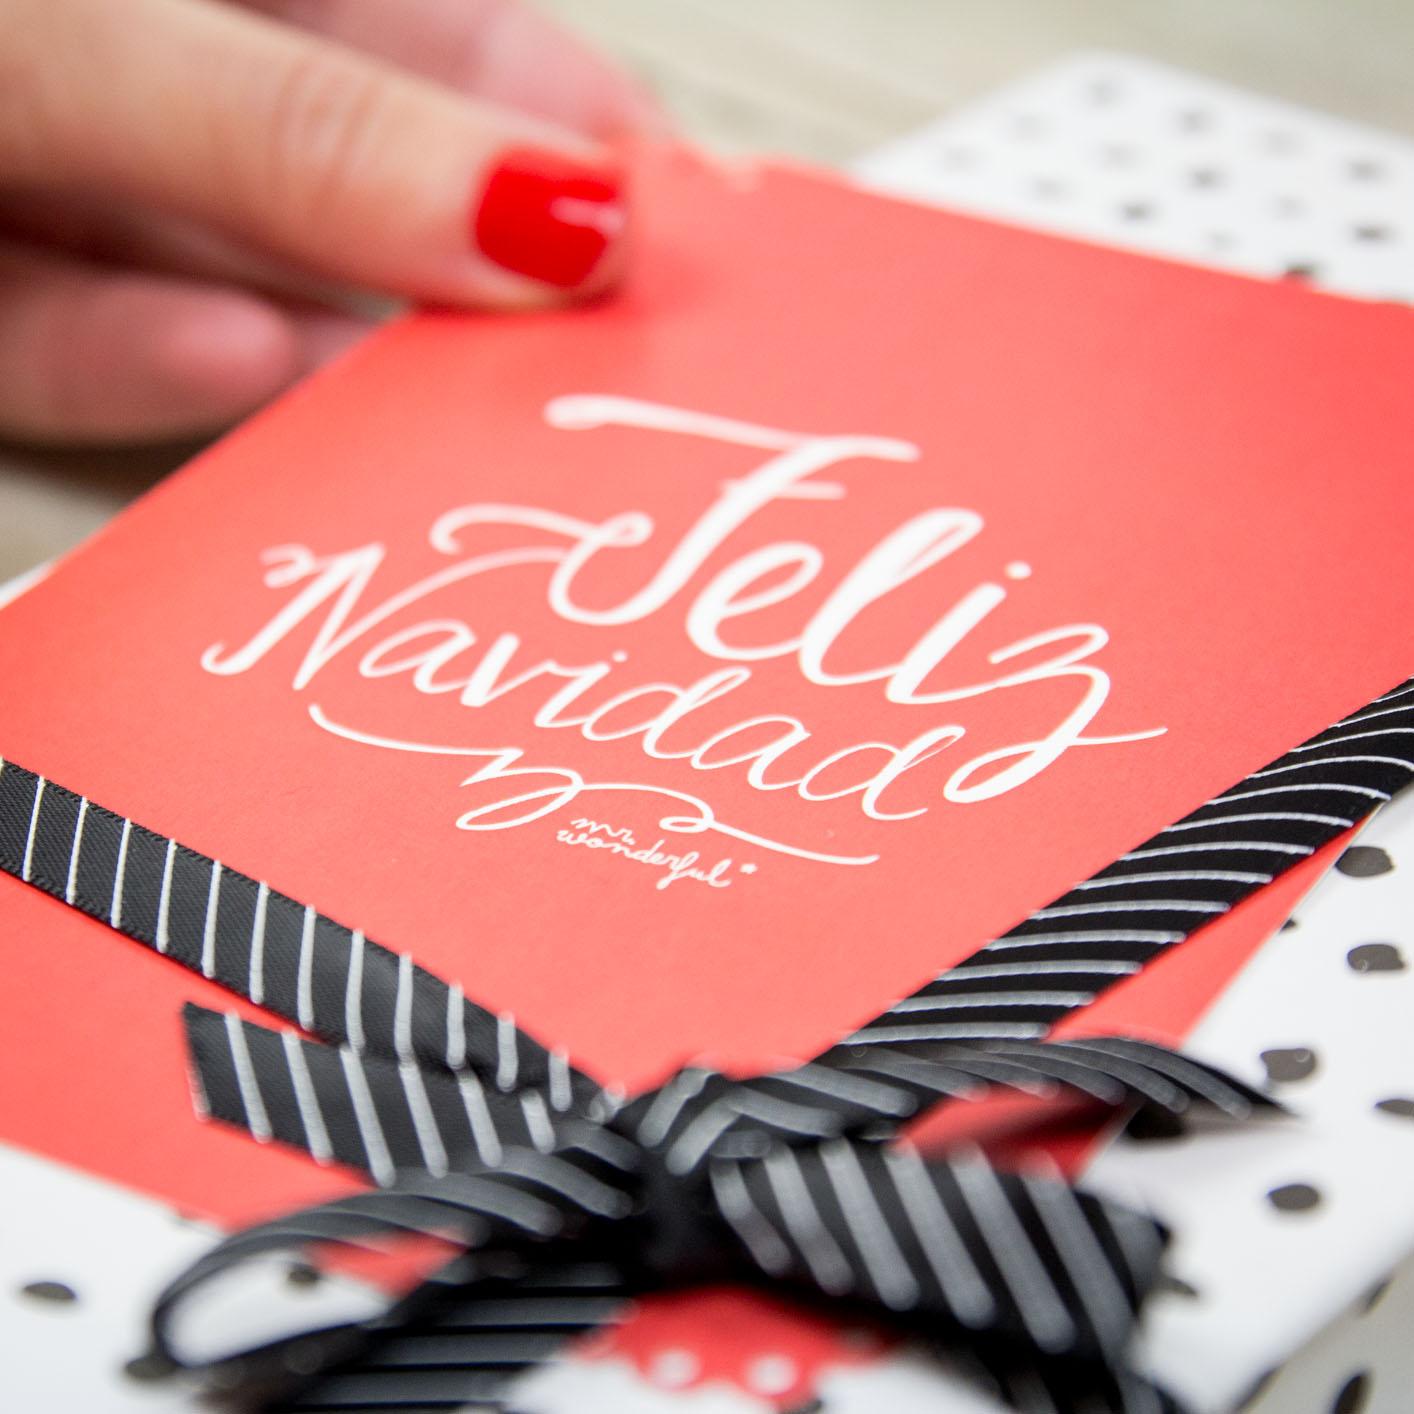 Mr_wonderful_tutorial_descargable_freebie_tarjeta_regalo_navidad_036